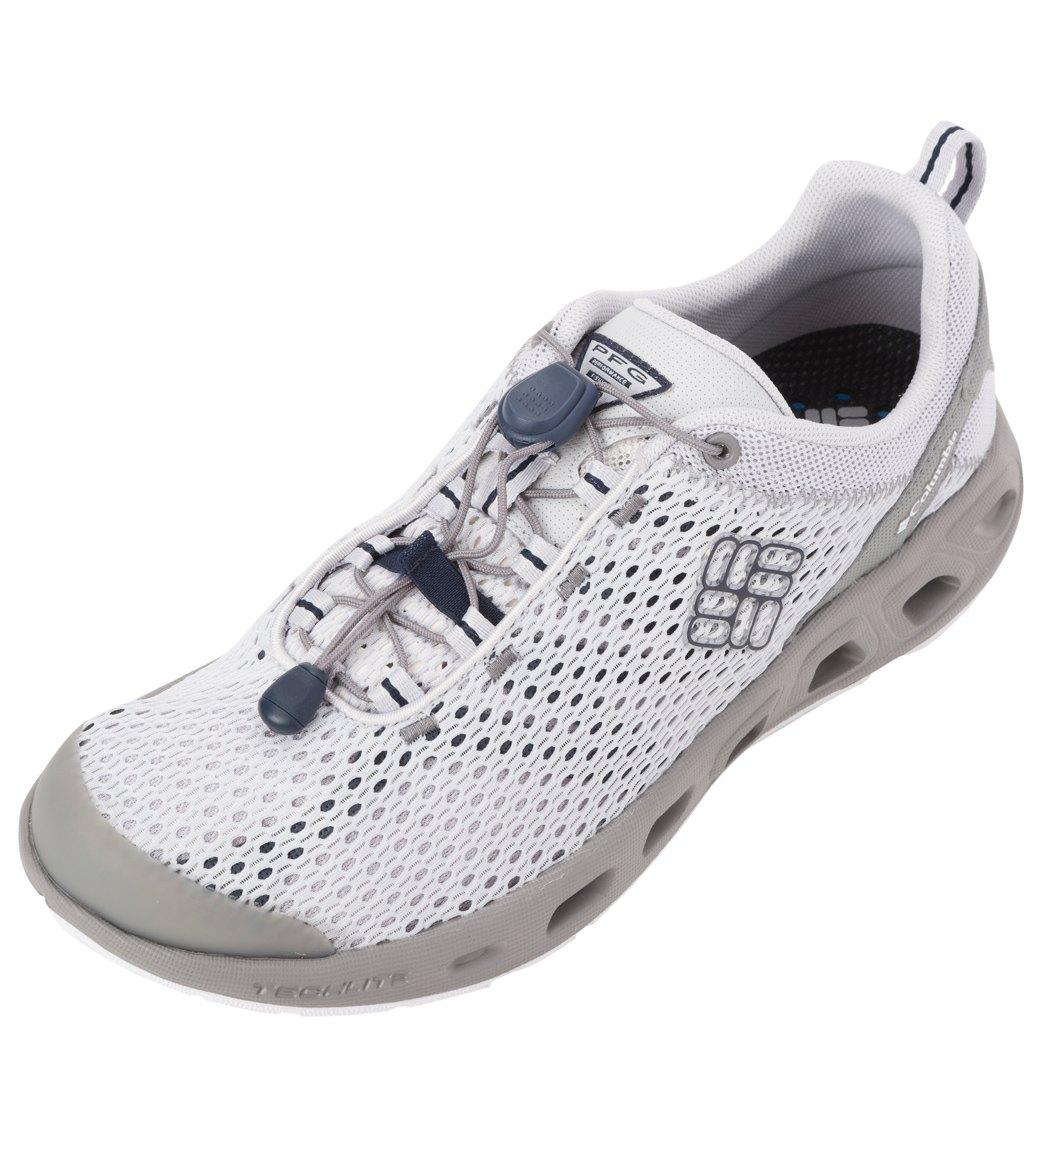 c59ce0c69644 ... Columbia Men s Drainmaker III PFG Water Shoes. Share